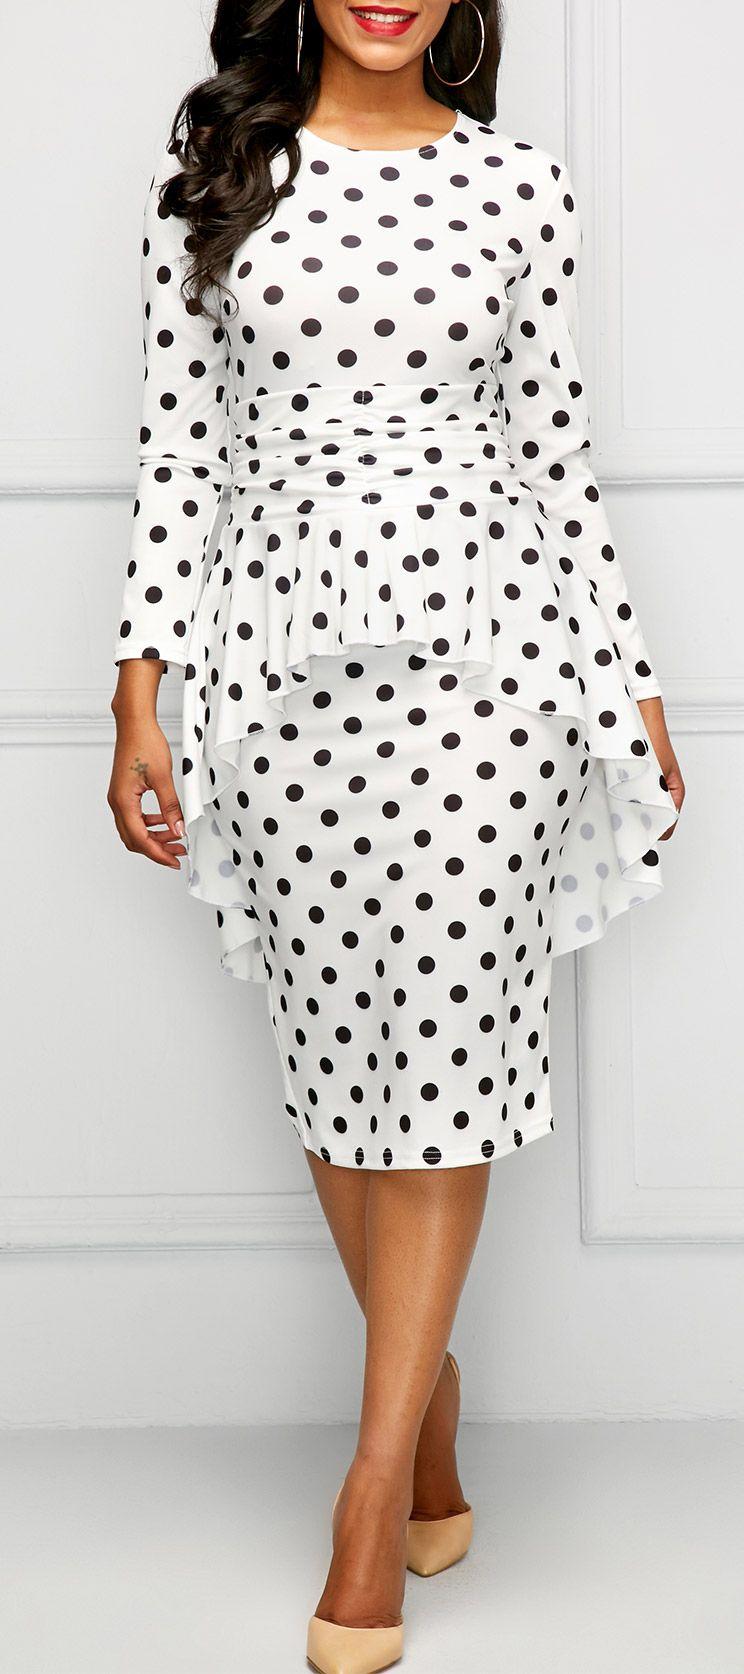 Long Sleeve Overlay Polka Dot Dress Fashion Shop Casual Dresses Clothes [ 1674 x 744 Pixel ]